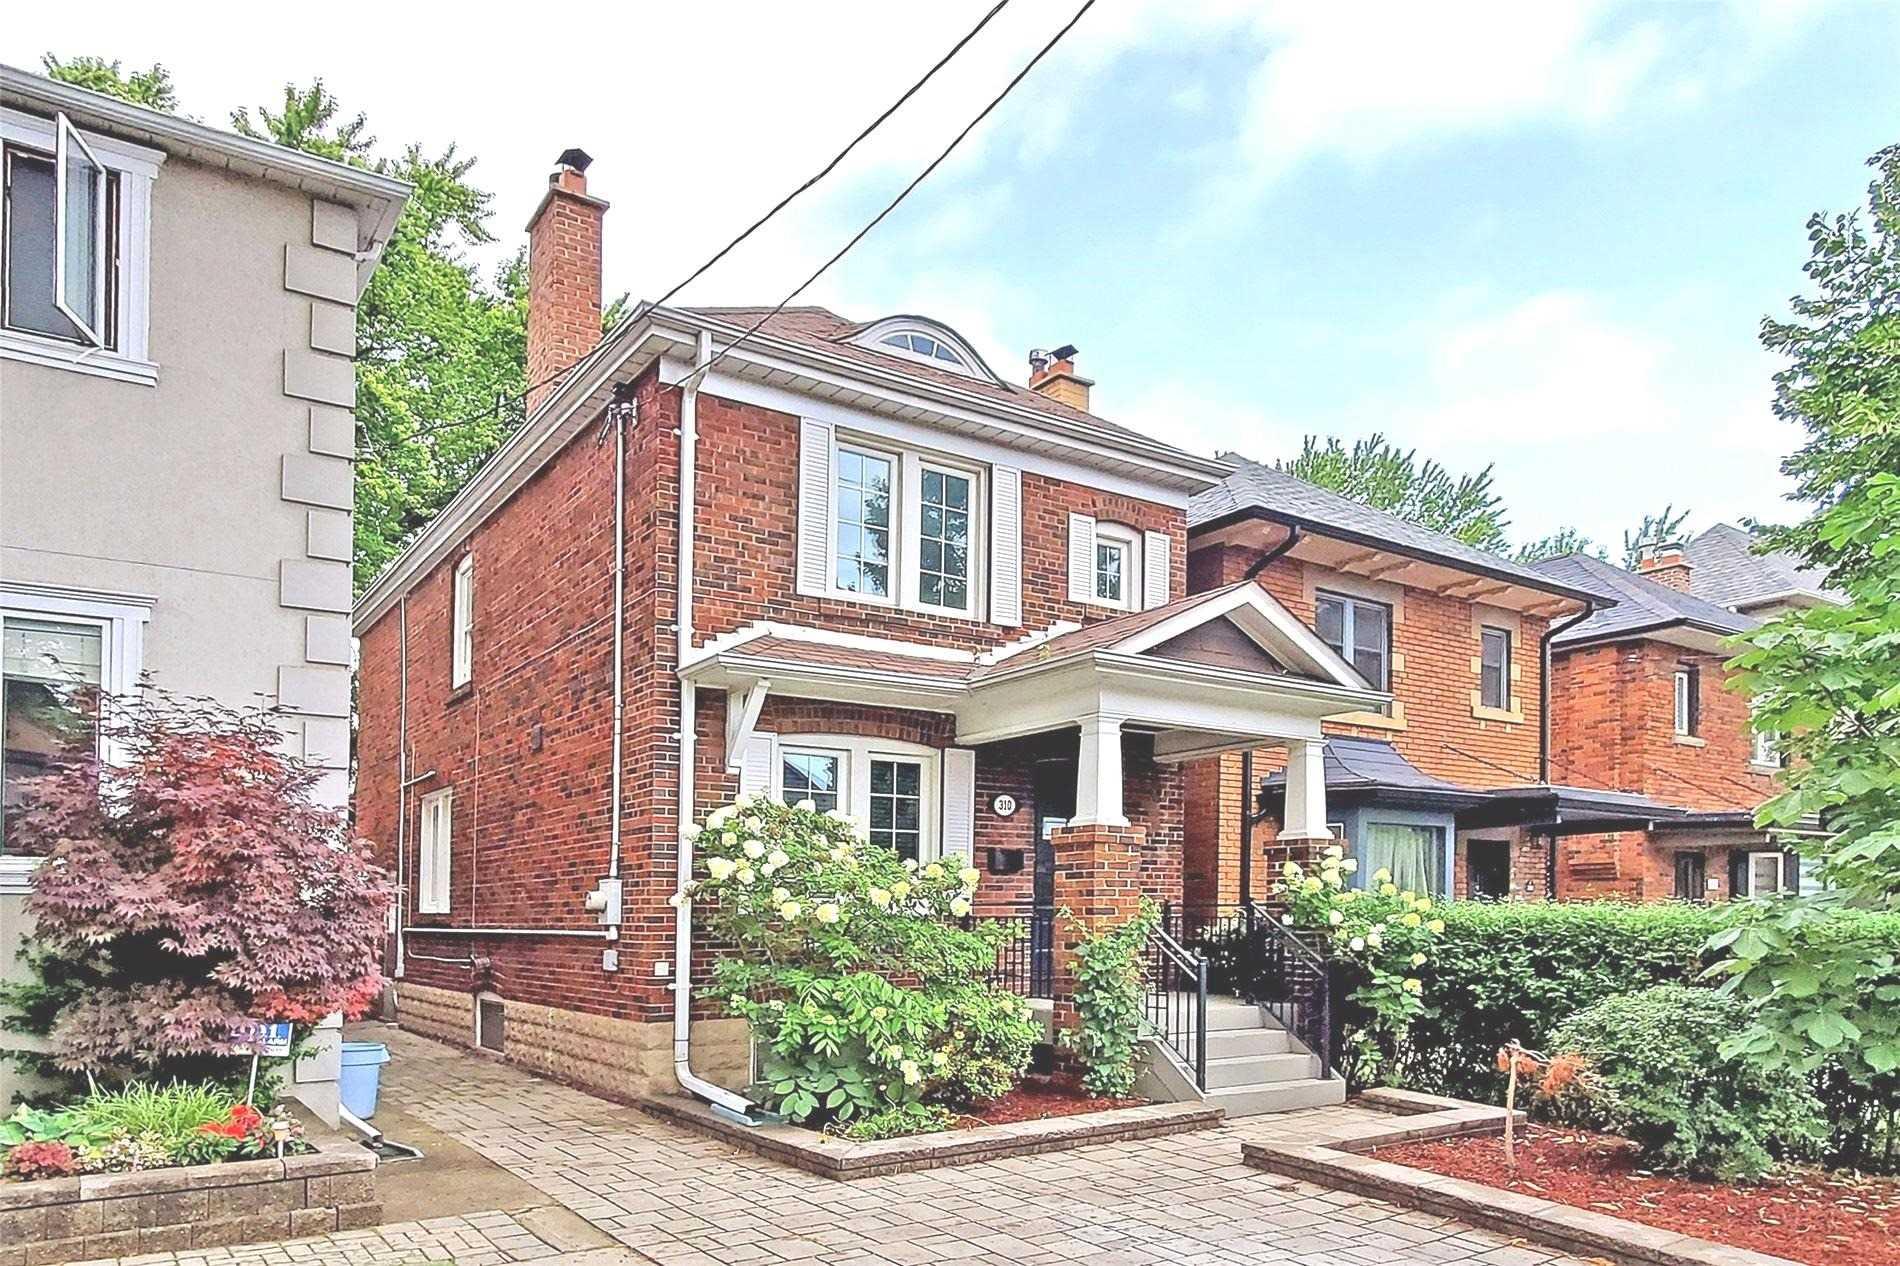 310 Cranbrooke Ave - Lawrence Park North Detached for sale, 3 Bedrooms (C5323718) - #1